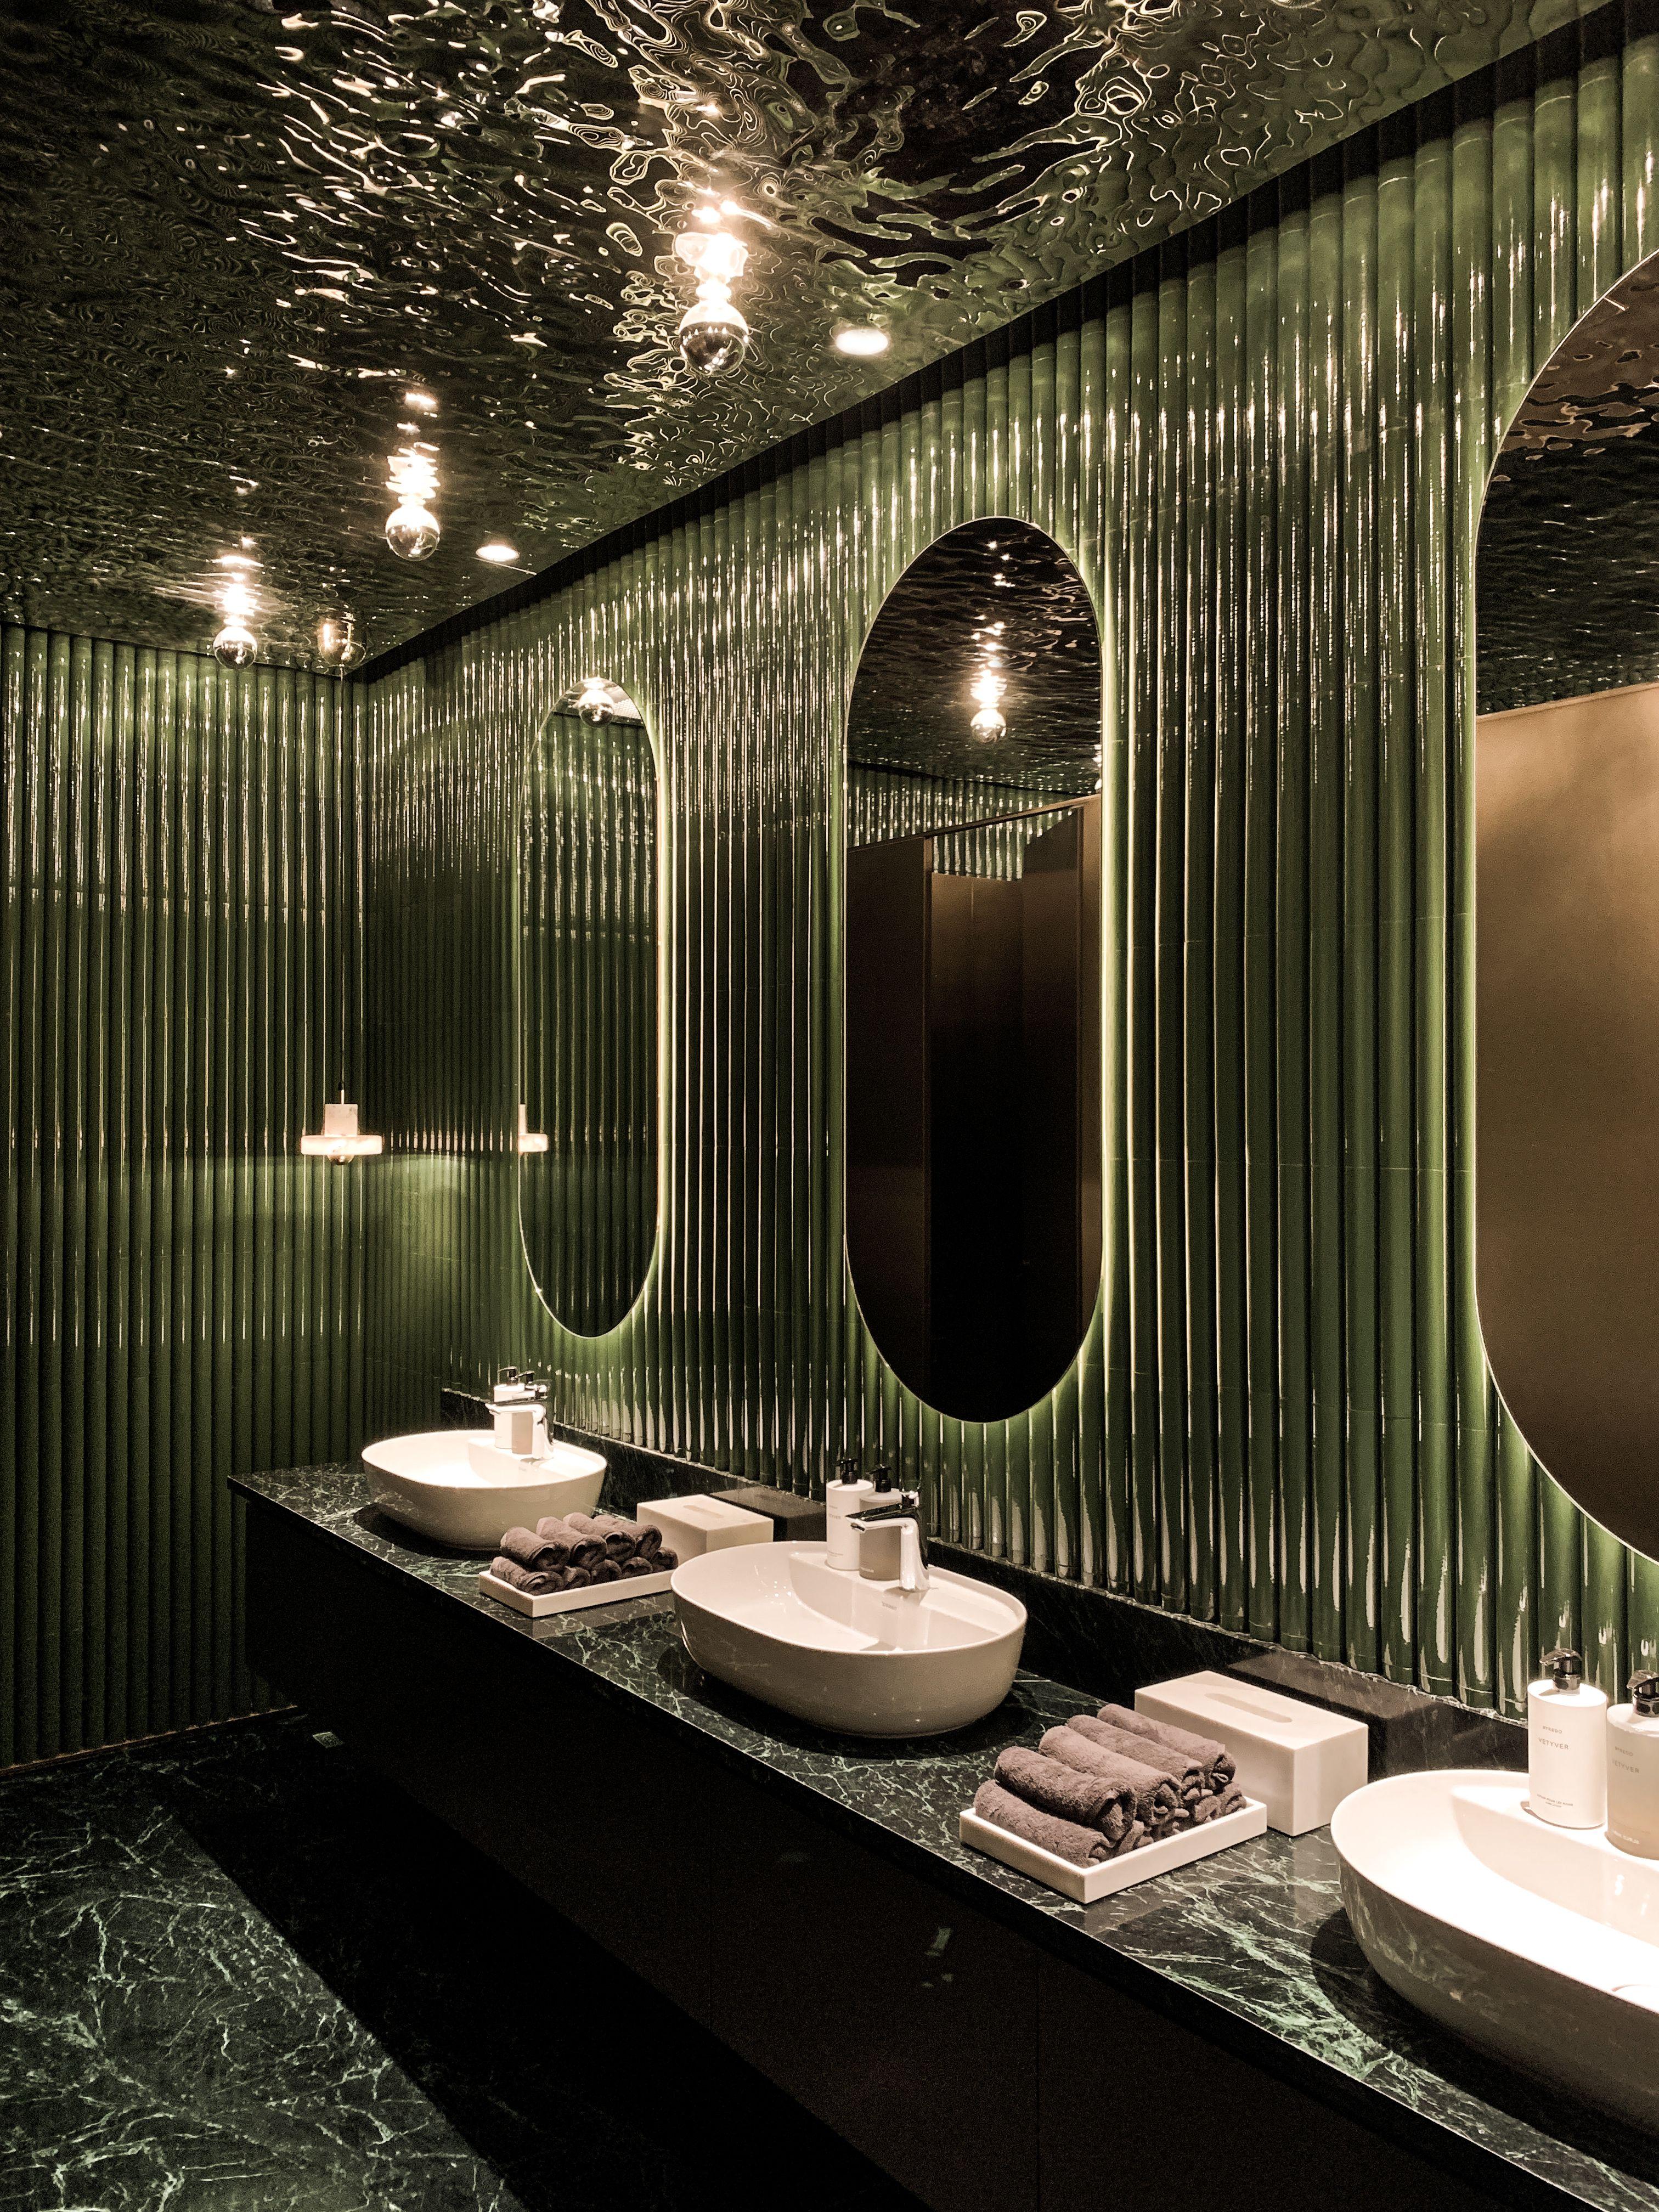 Rever Picture Gallery Restroom Design Restaurant Bathroom Cafe Interior Design